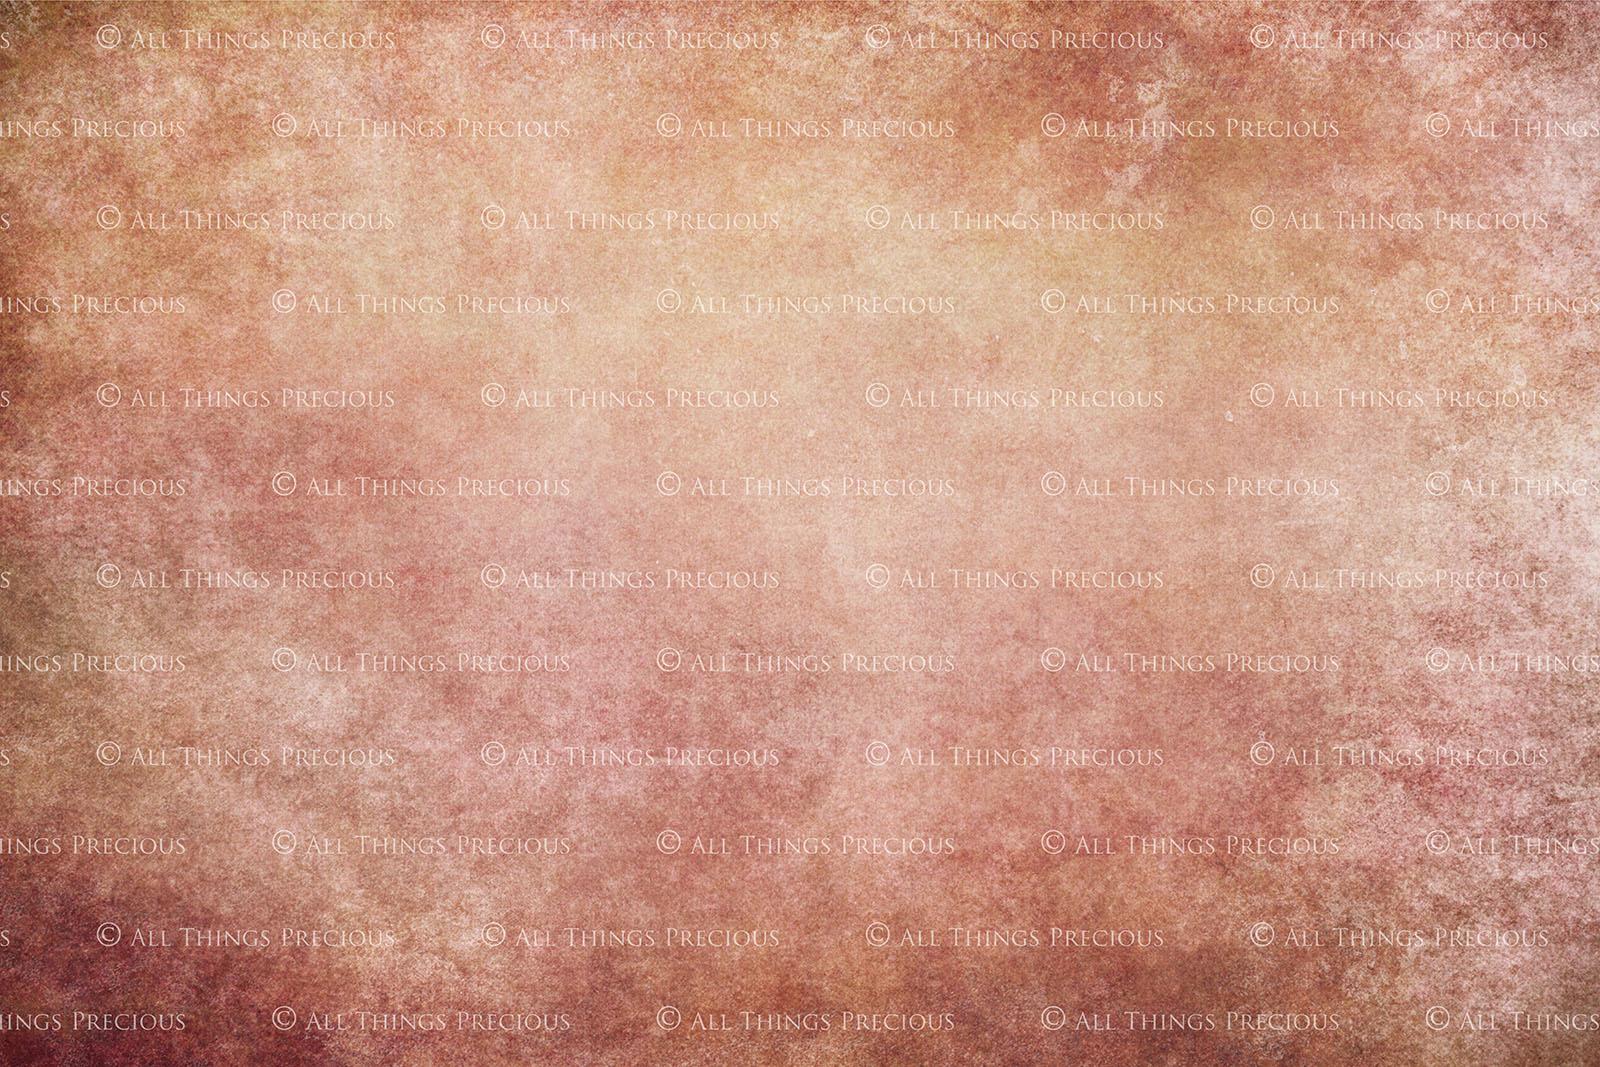 10 Fine Art BERRIES & CREAM Textures SET 1 example image 4